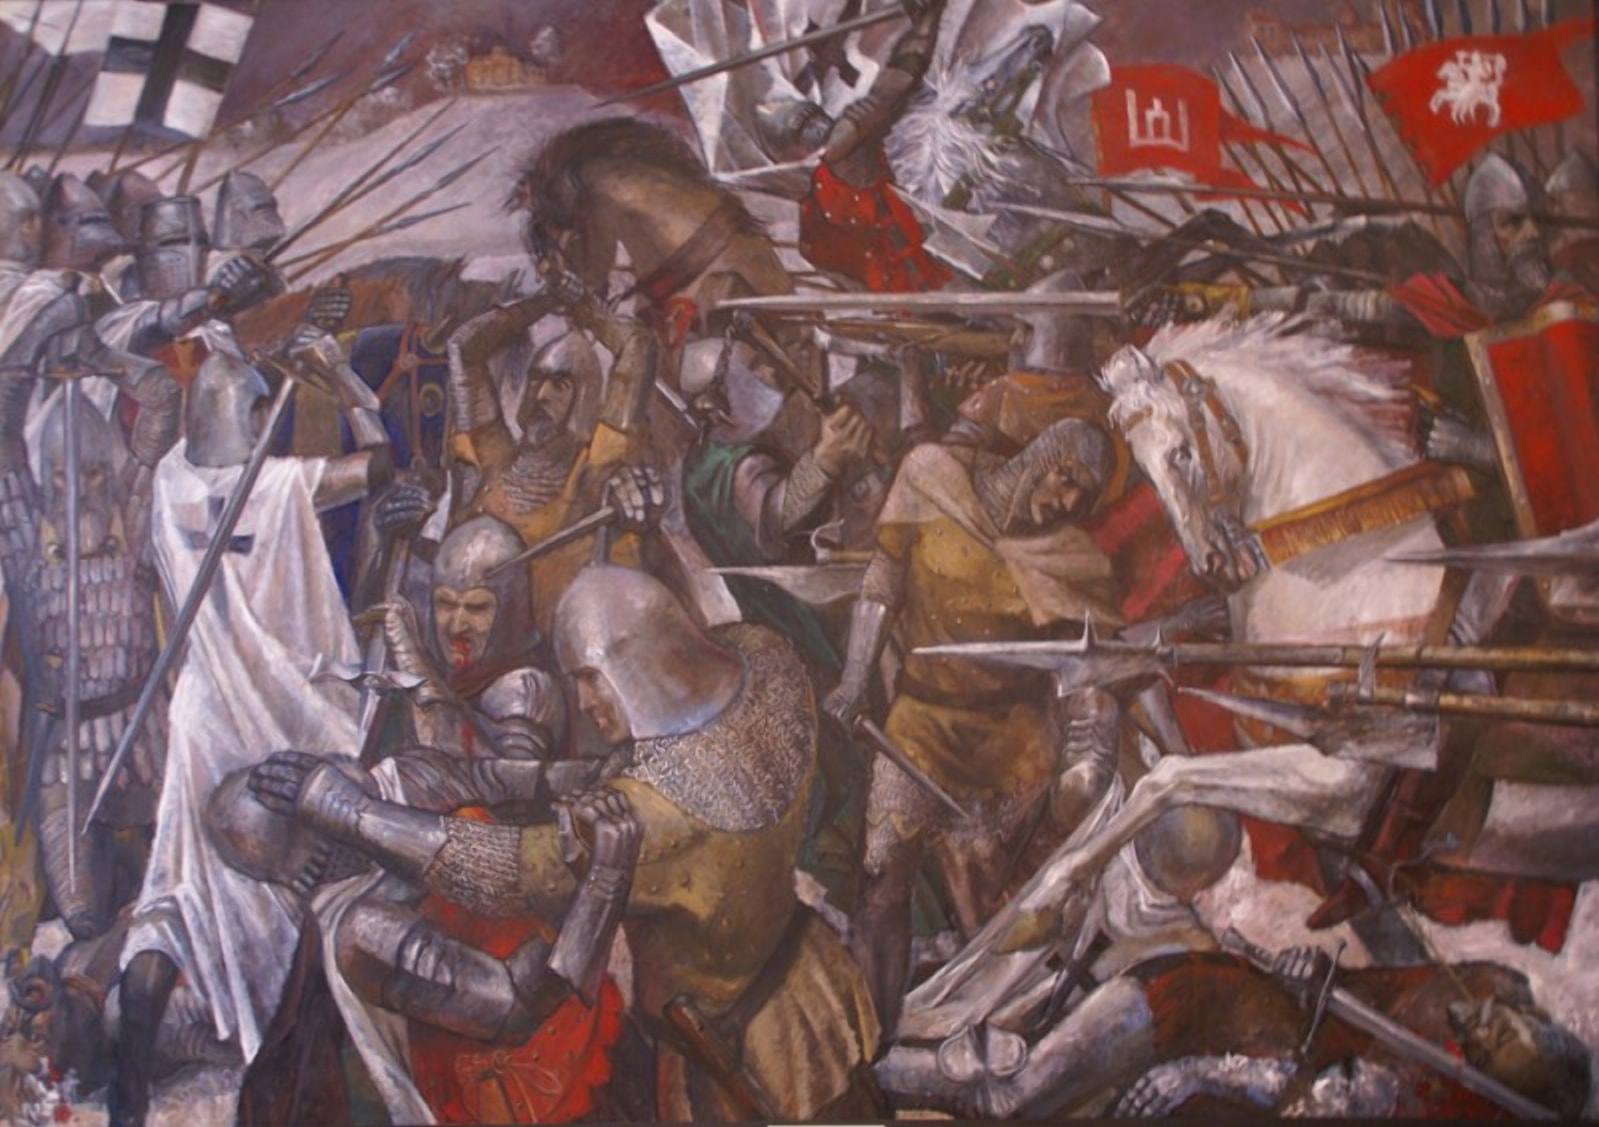 Давыд Городненский совершал набеги на земли Пруссии